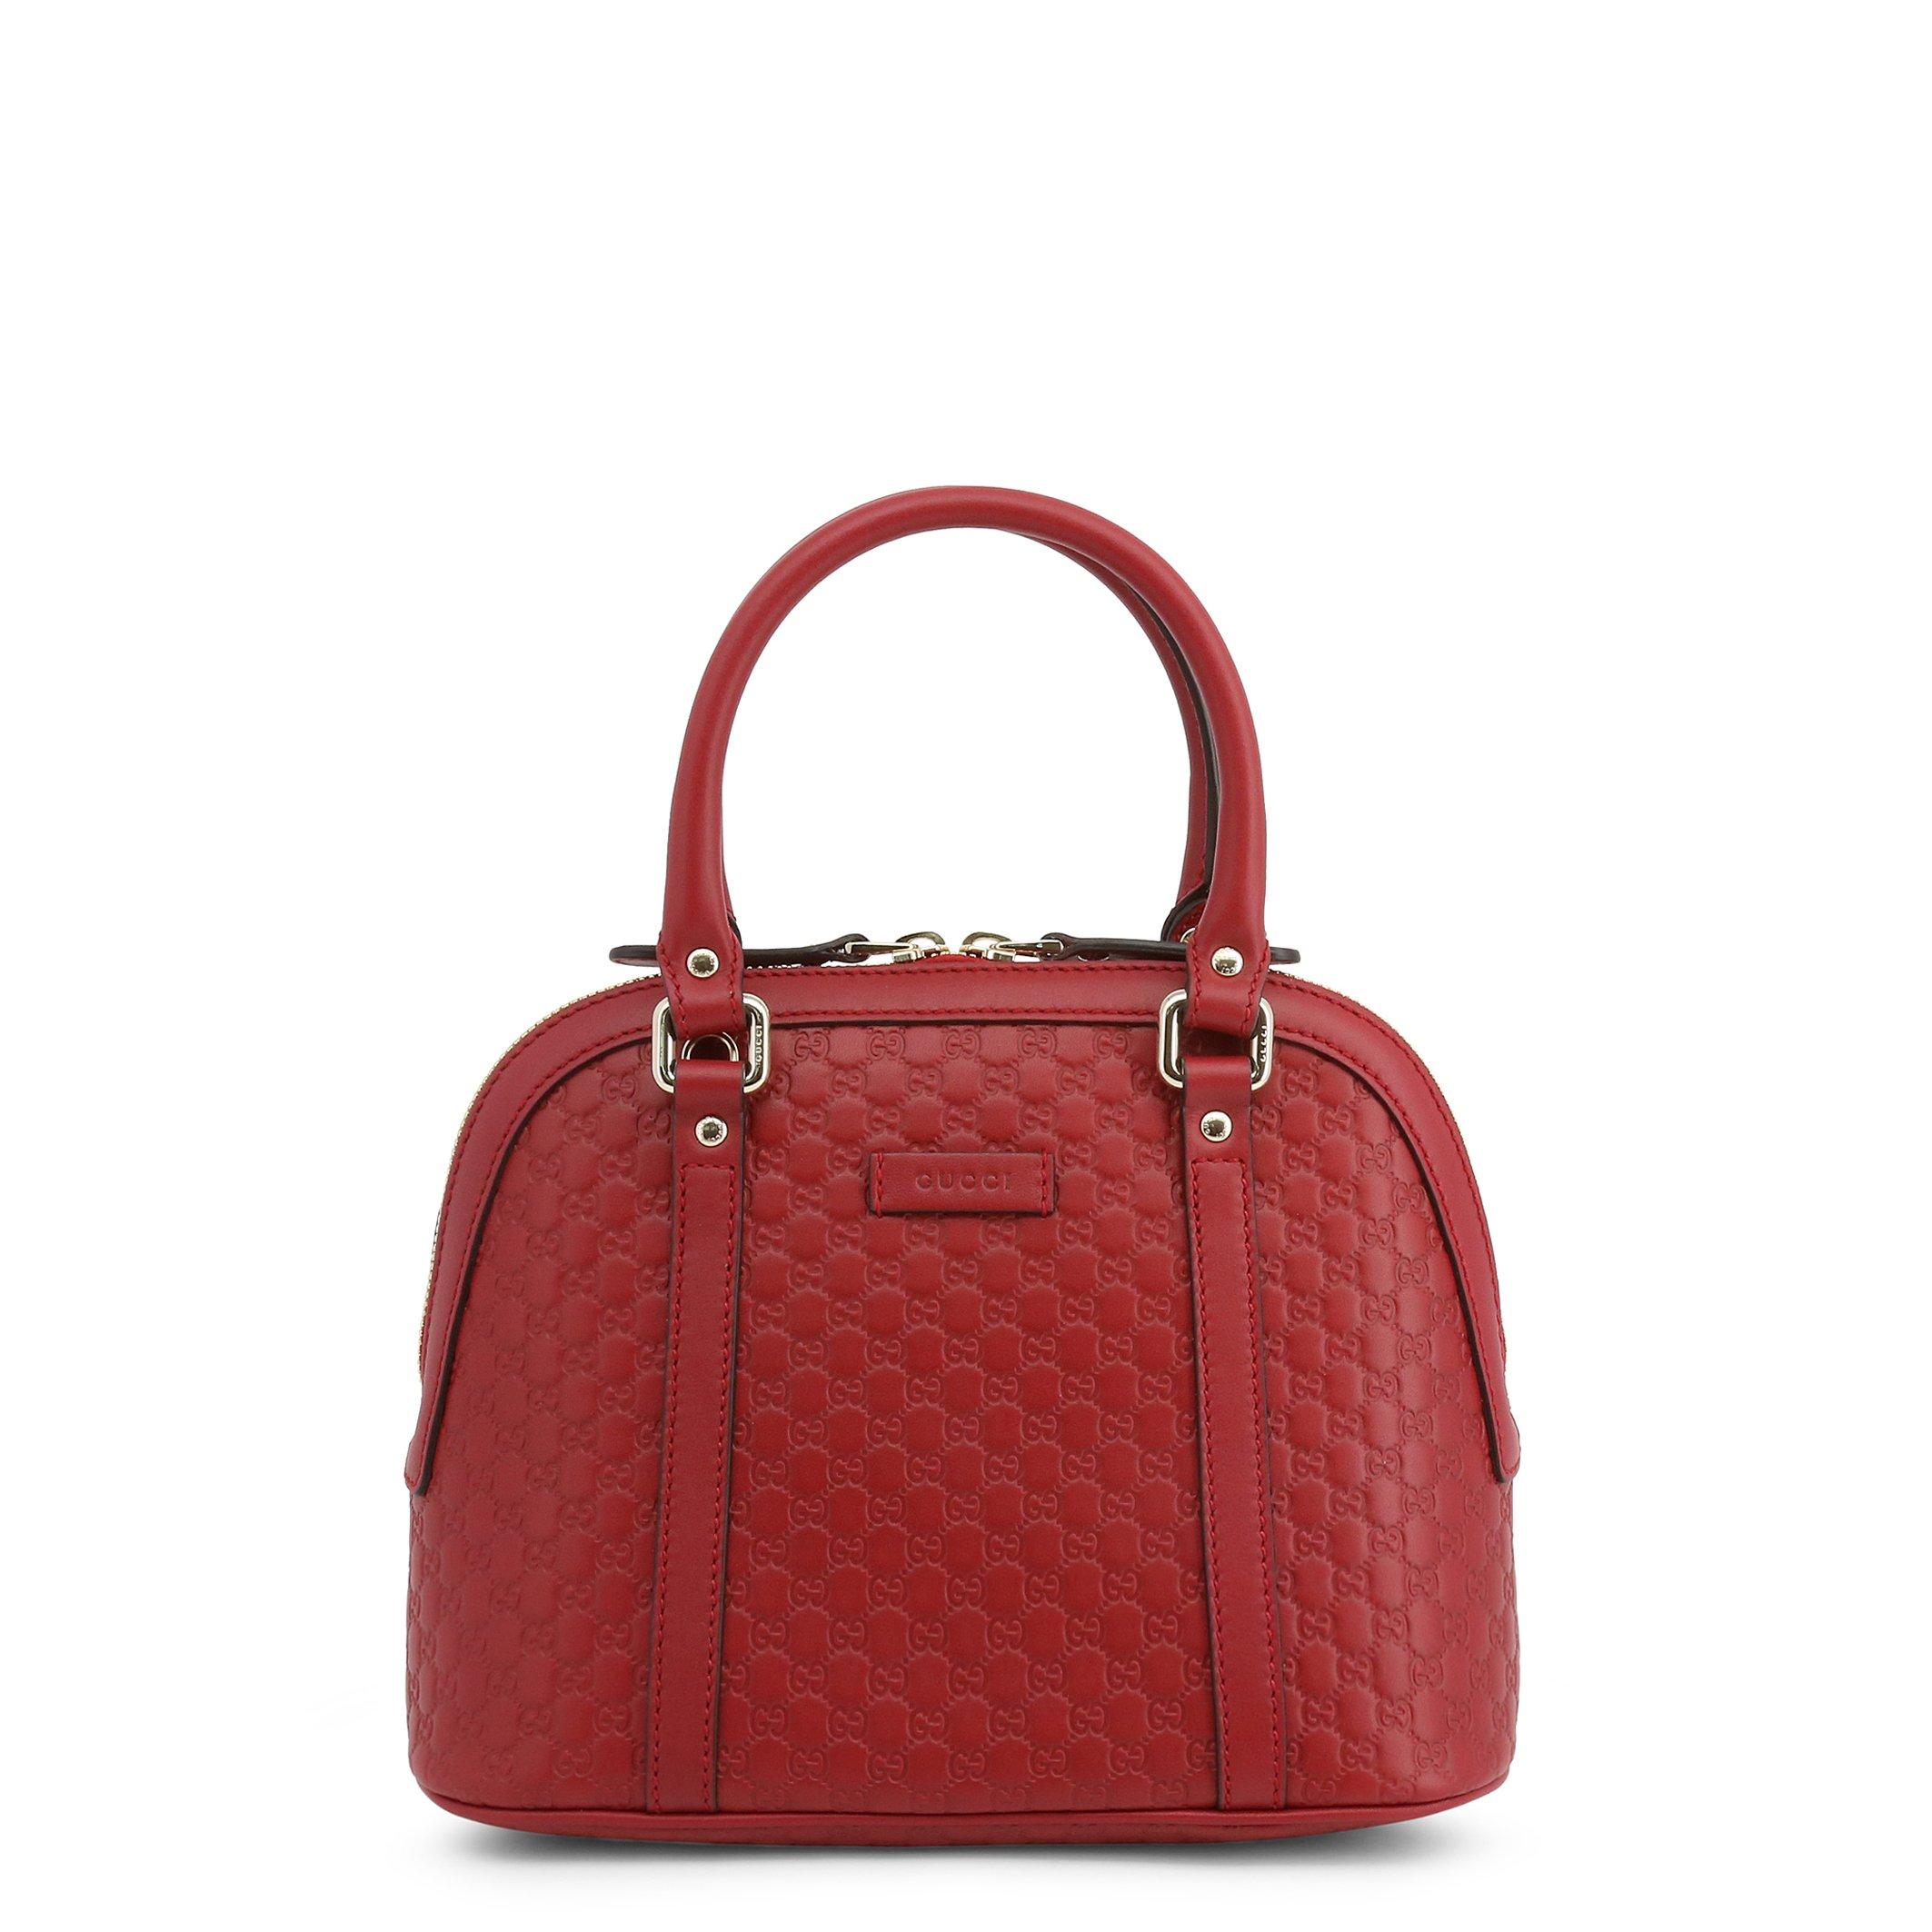 Gucci Women's Handbag Black 449654 - red NOSIZE